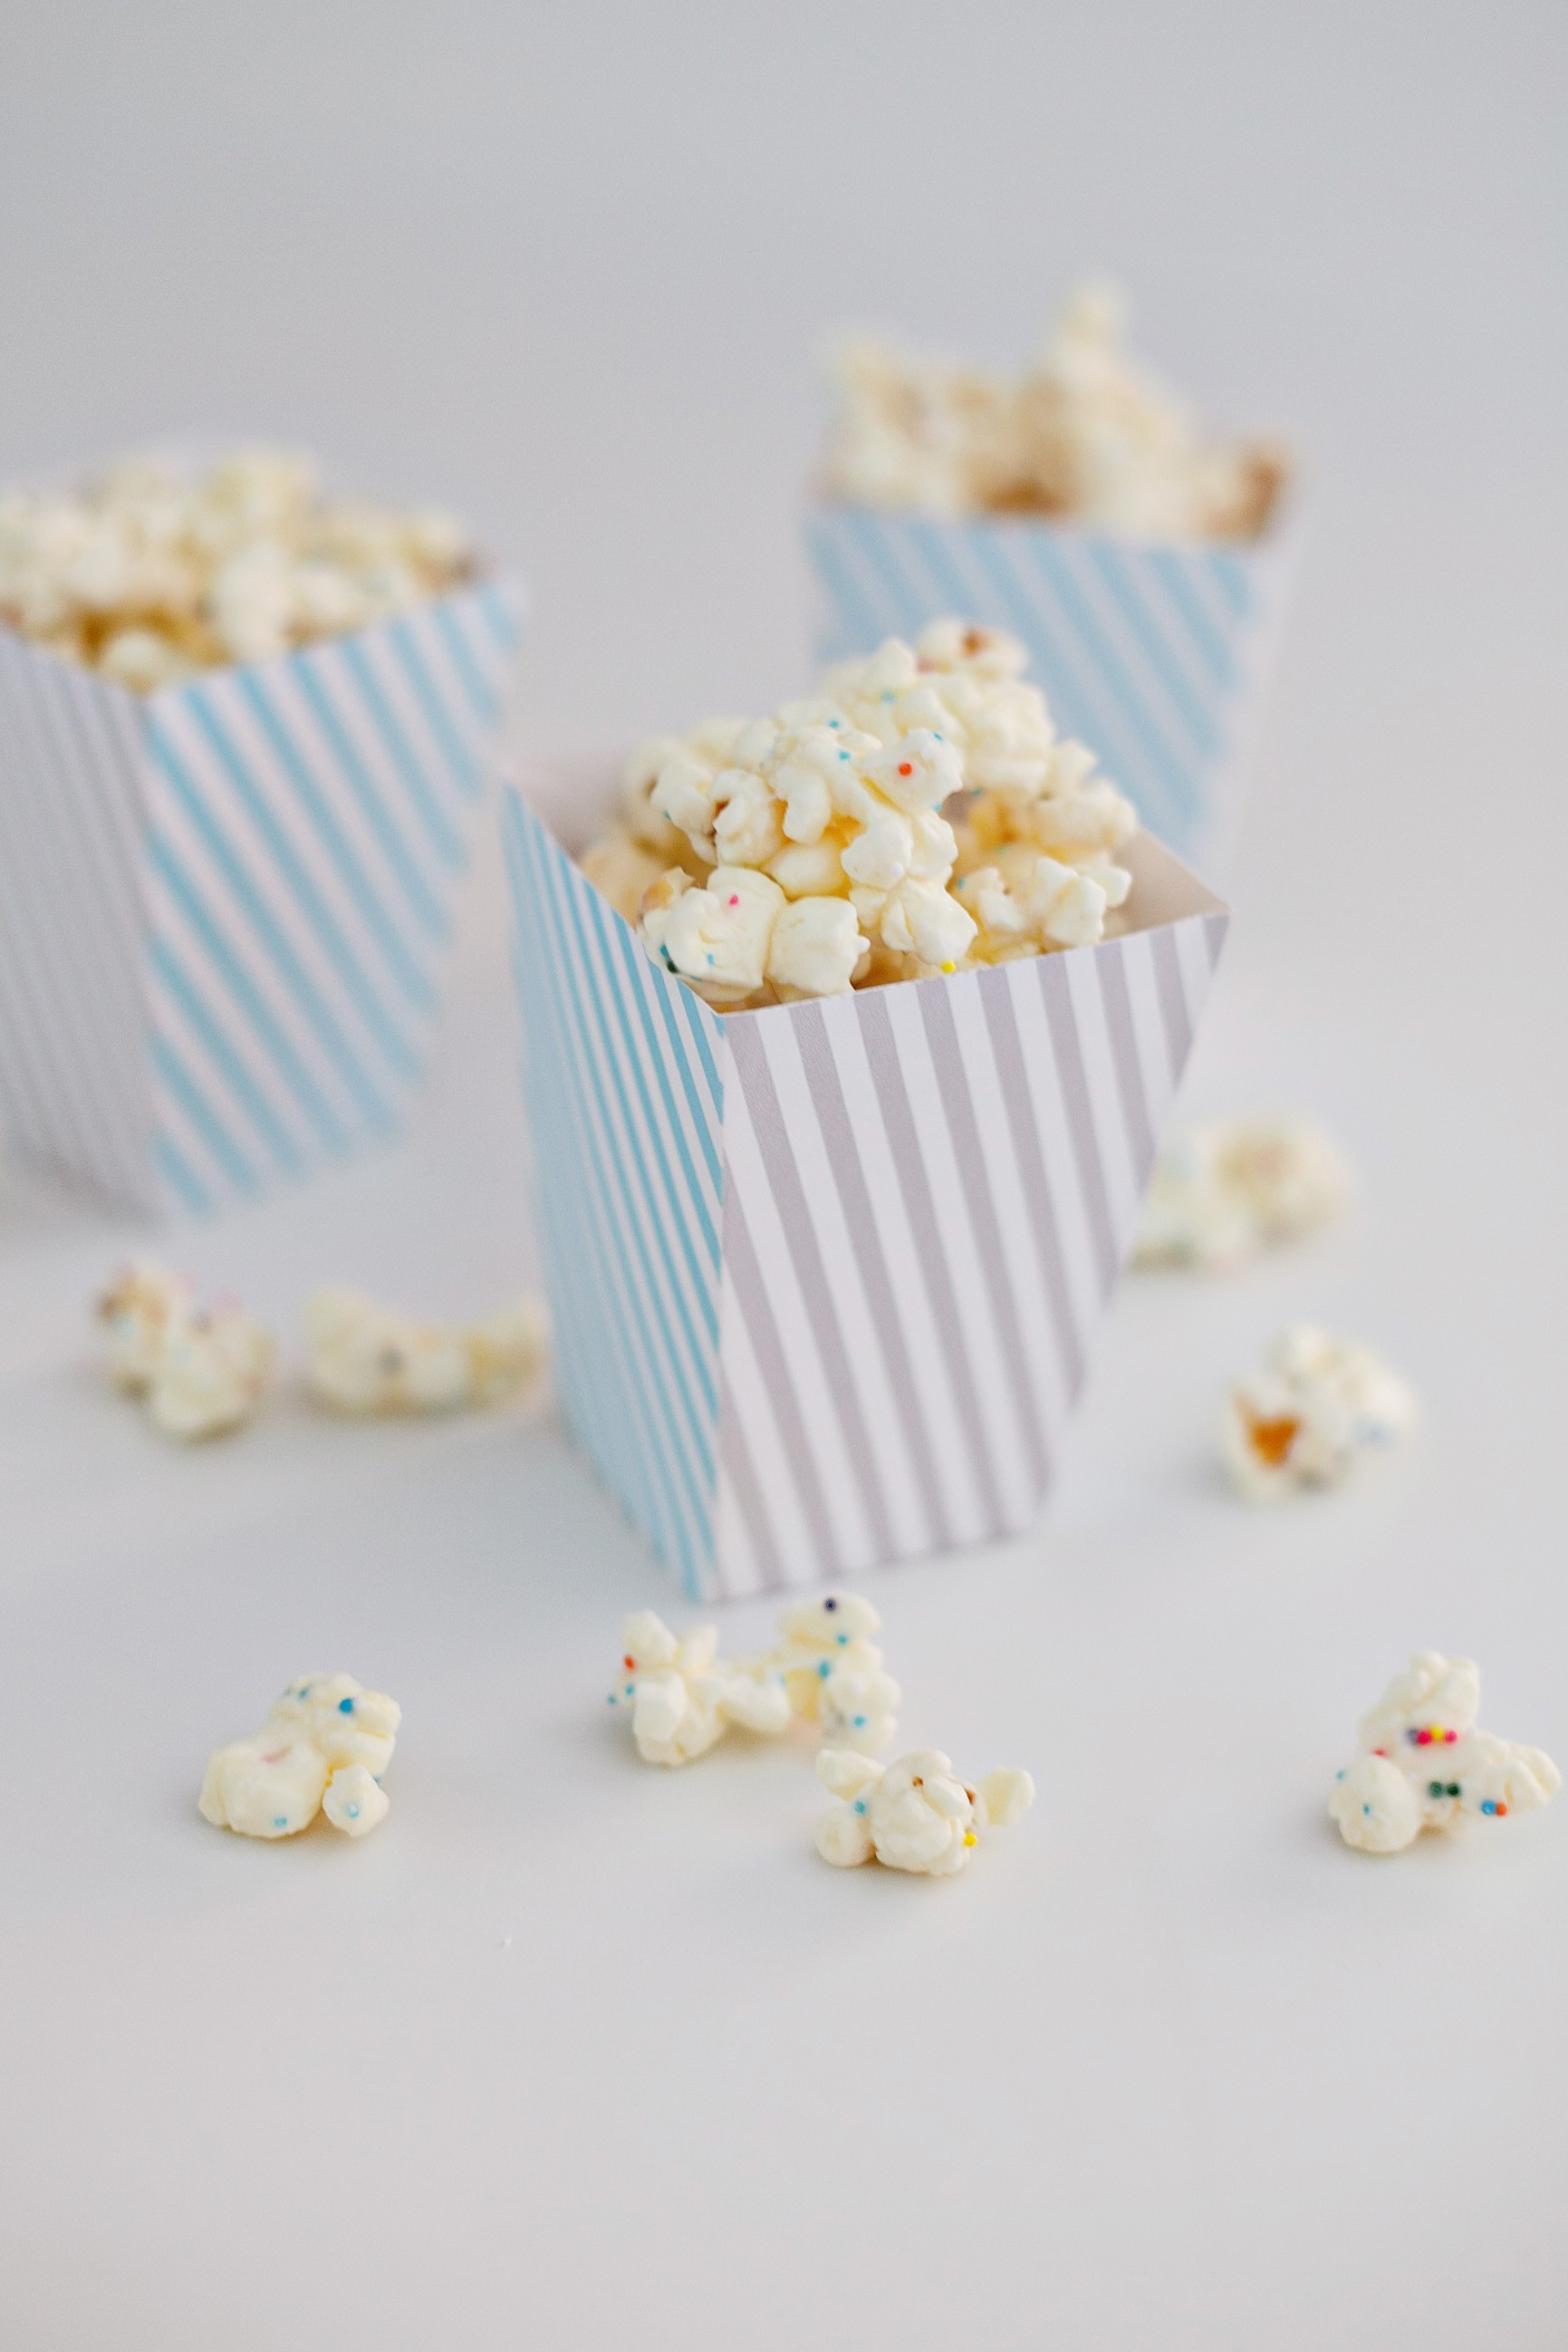 Diy Popcorn Box Template  Diy Do It Your Self